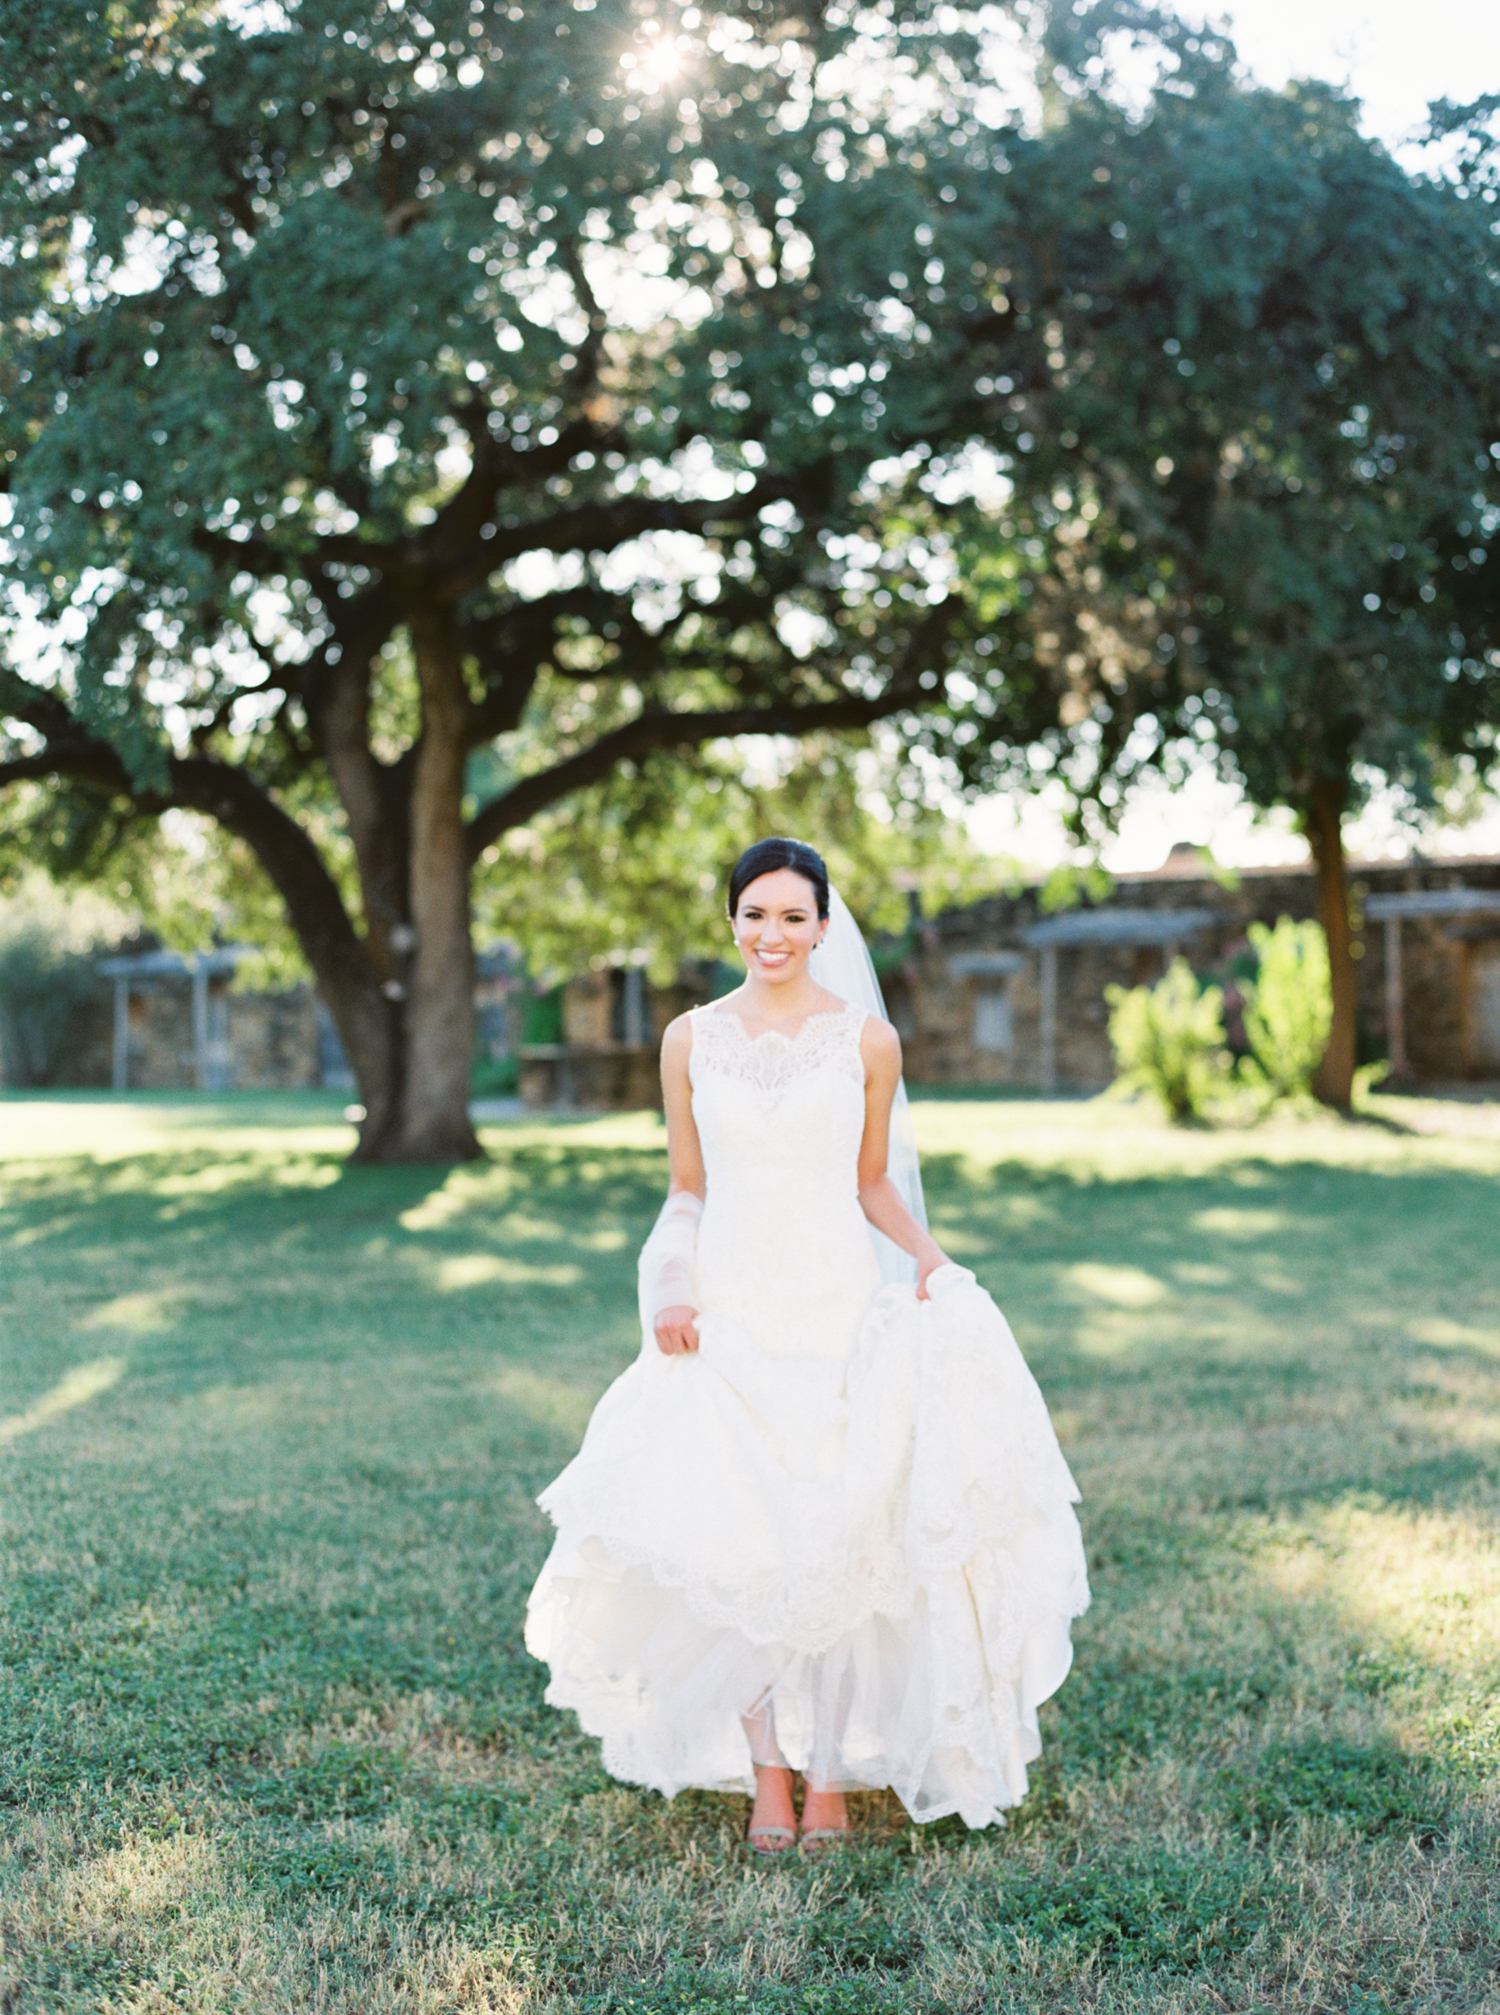 AUSTIN WEDDING PHOTOGRAPHER-1-2.jpg